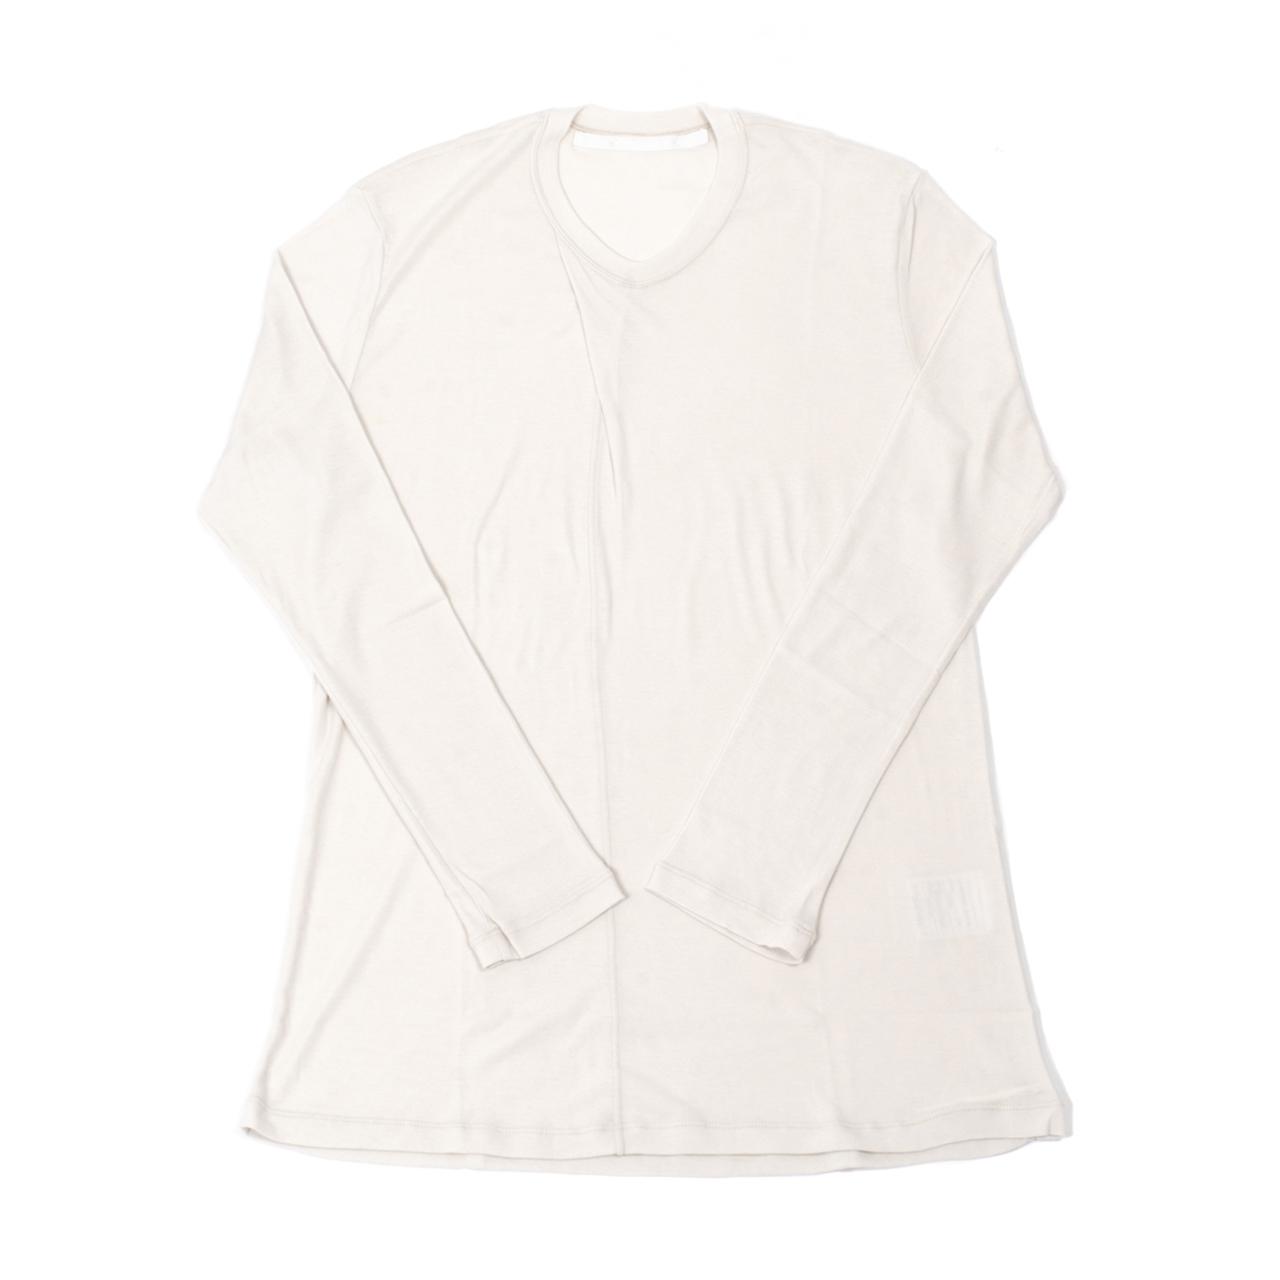 707CUM5-PLASTER / カラータック ロングスリーブ Tシャツ